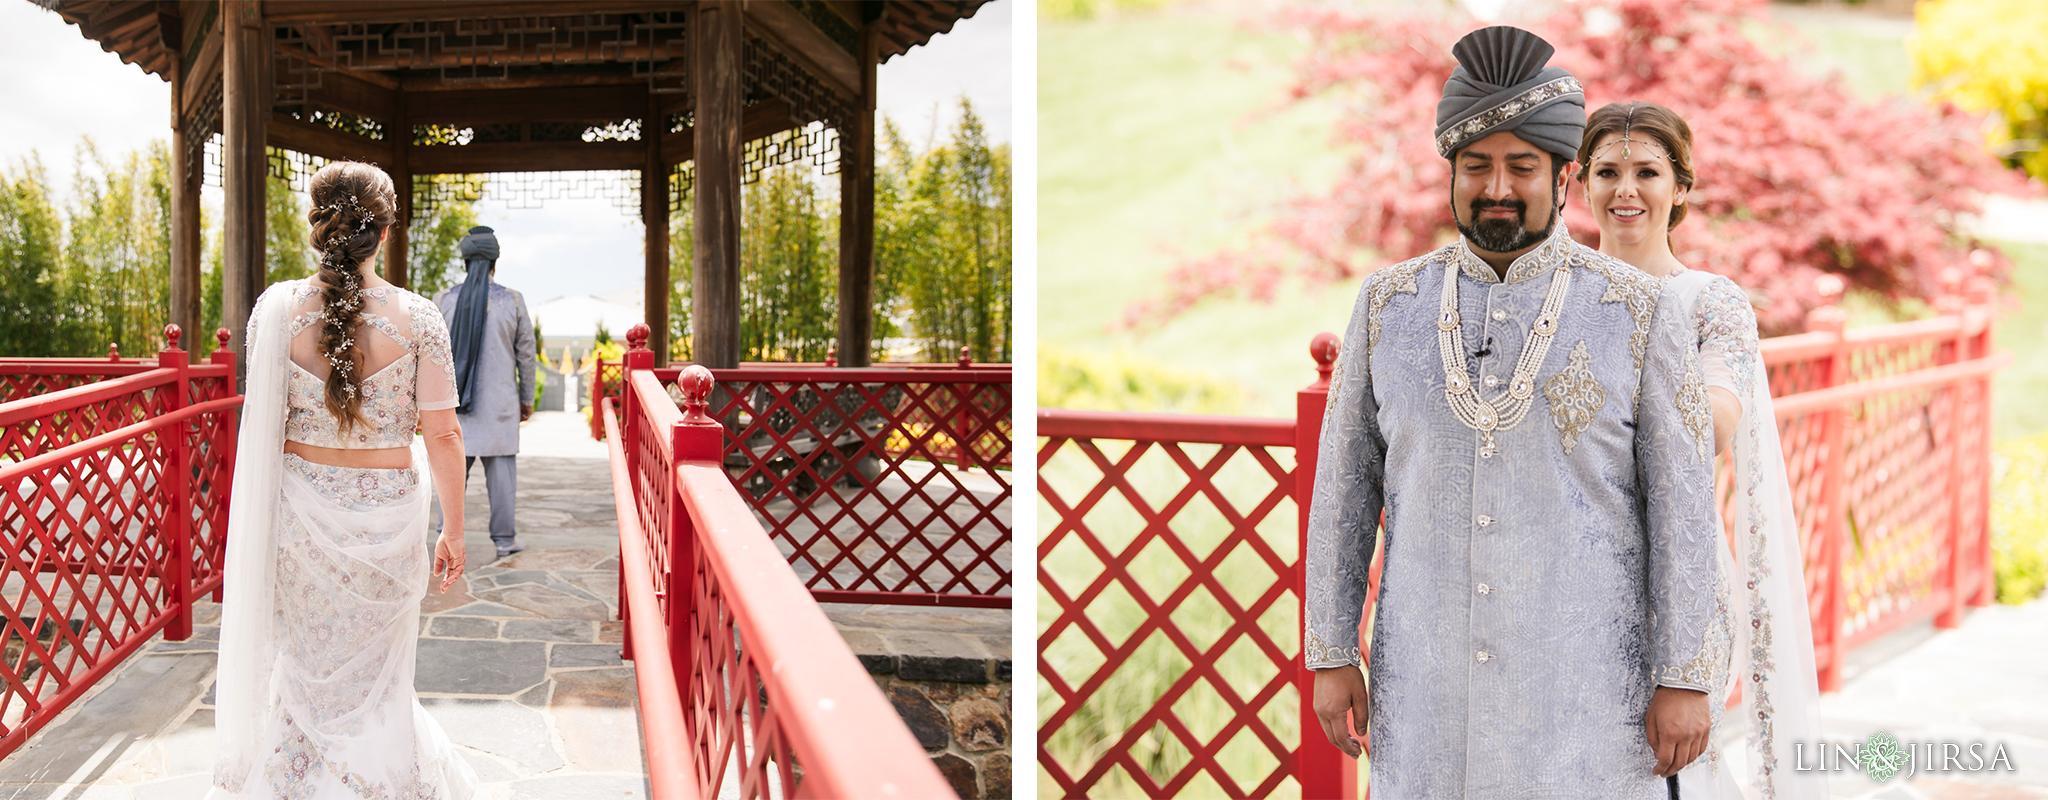 08 Four Seasons Westlake Village Indian Wedding Photographer